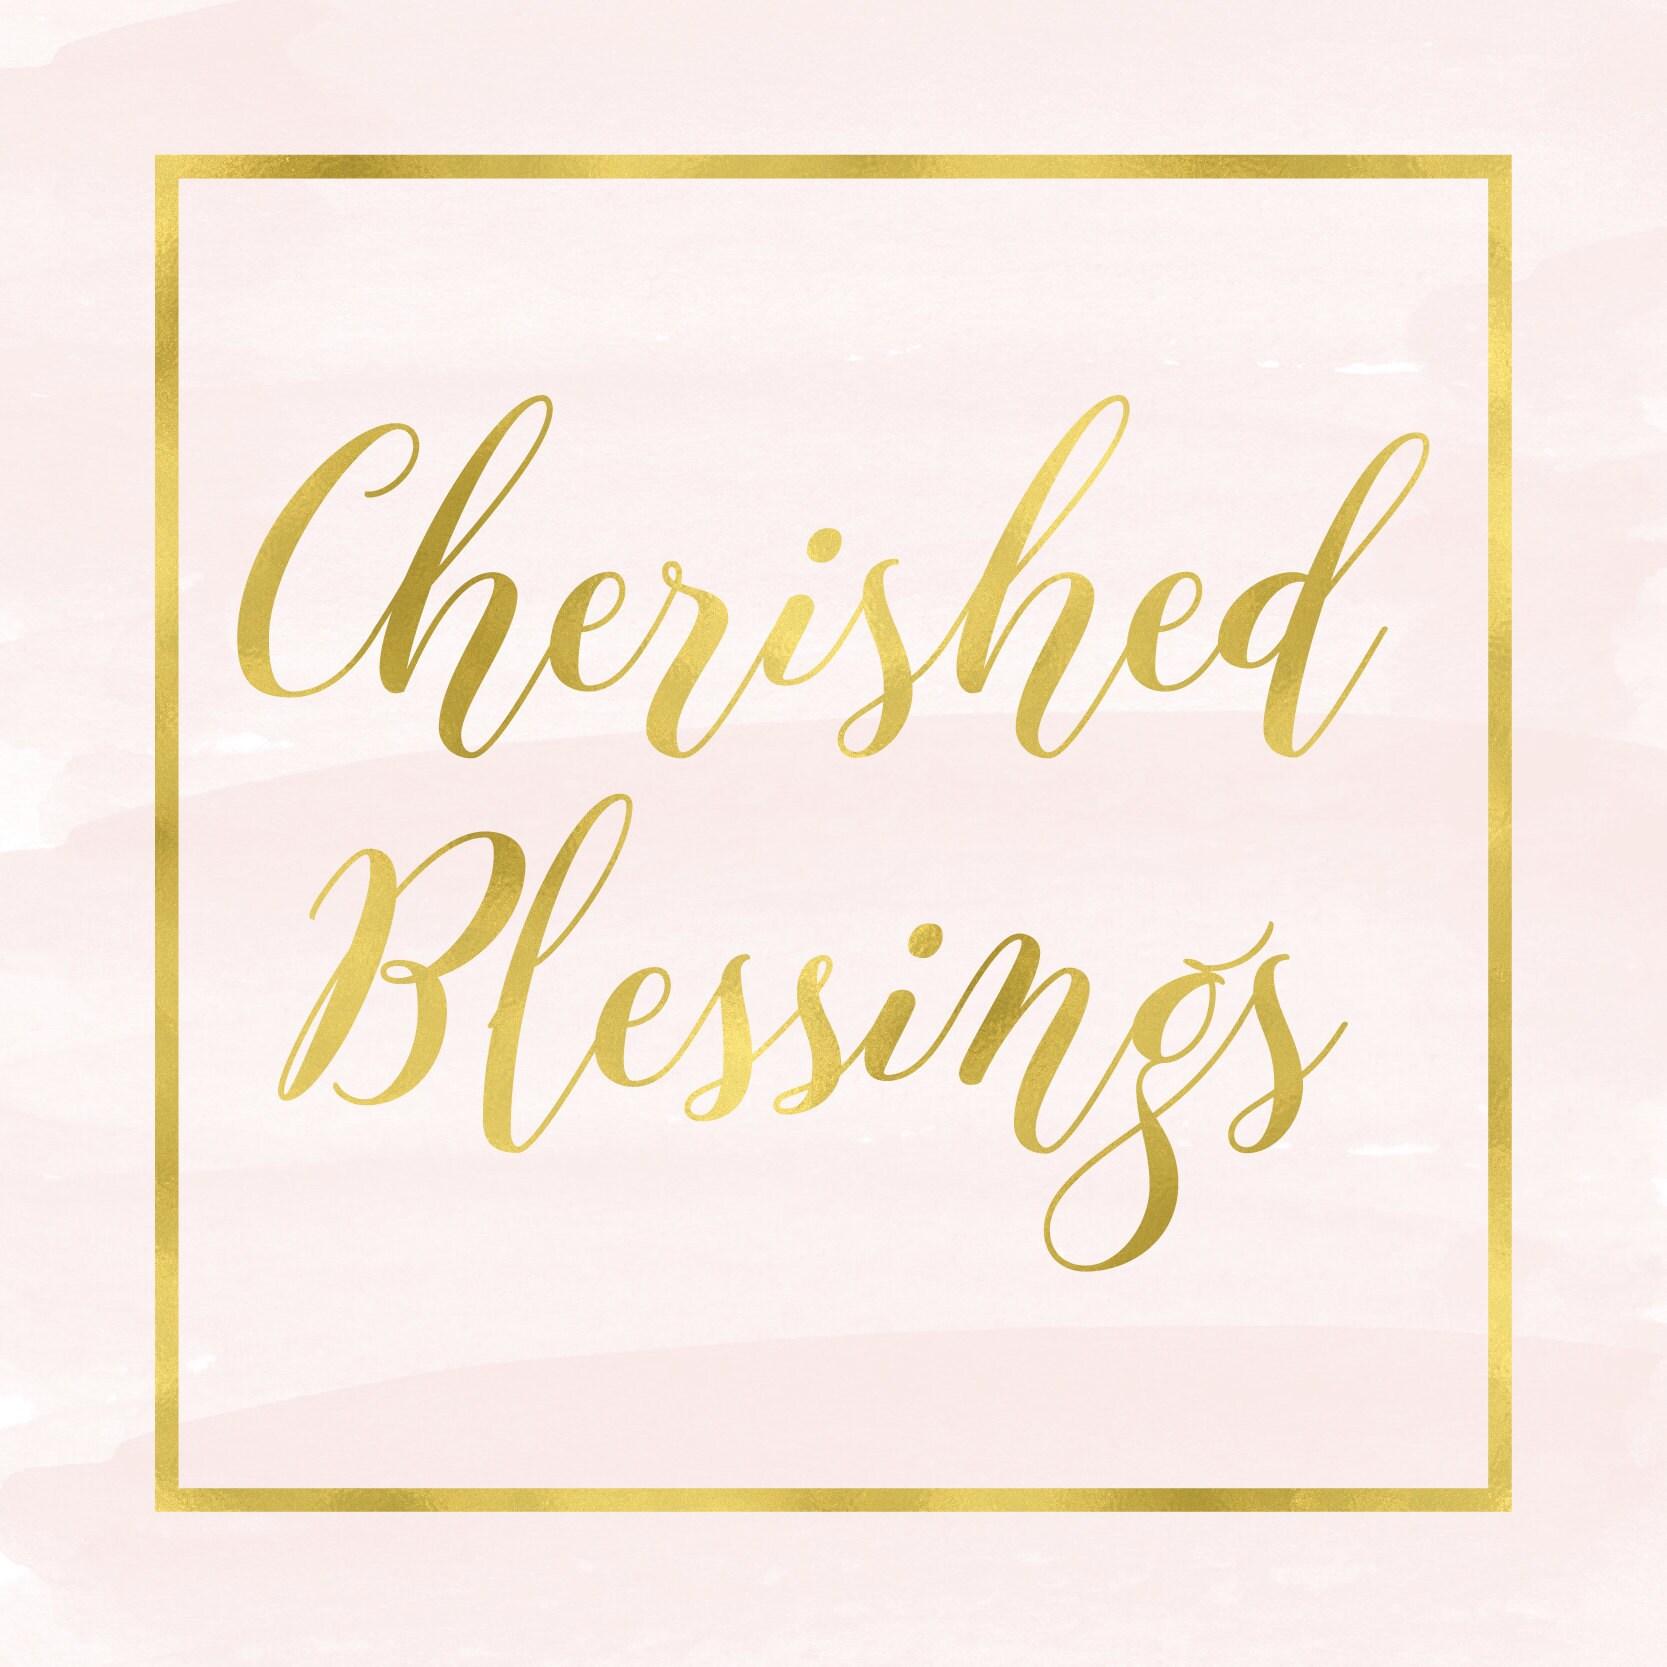 CherishedBlessings